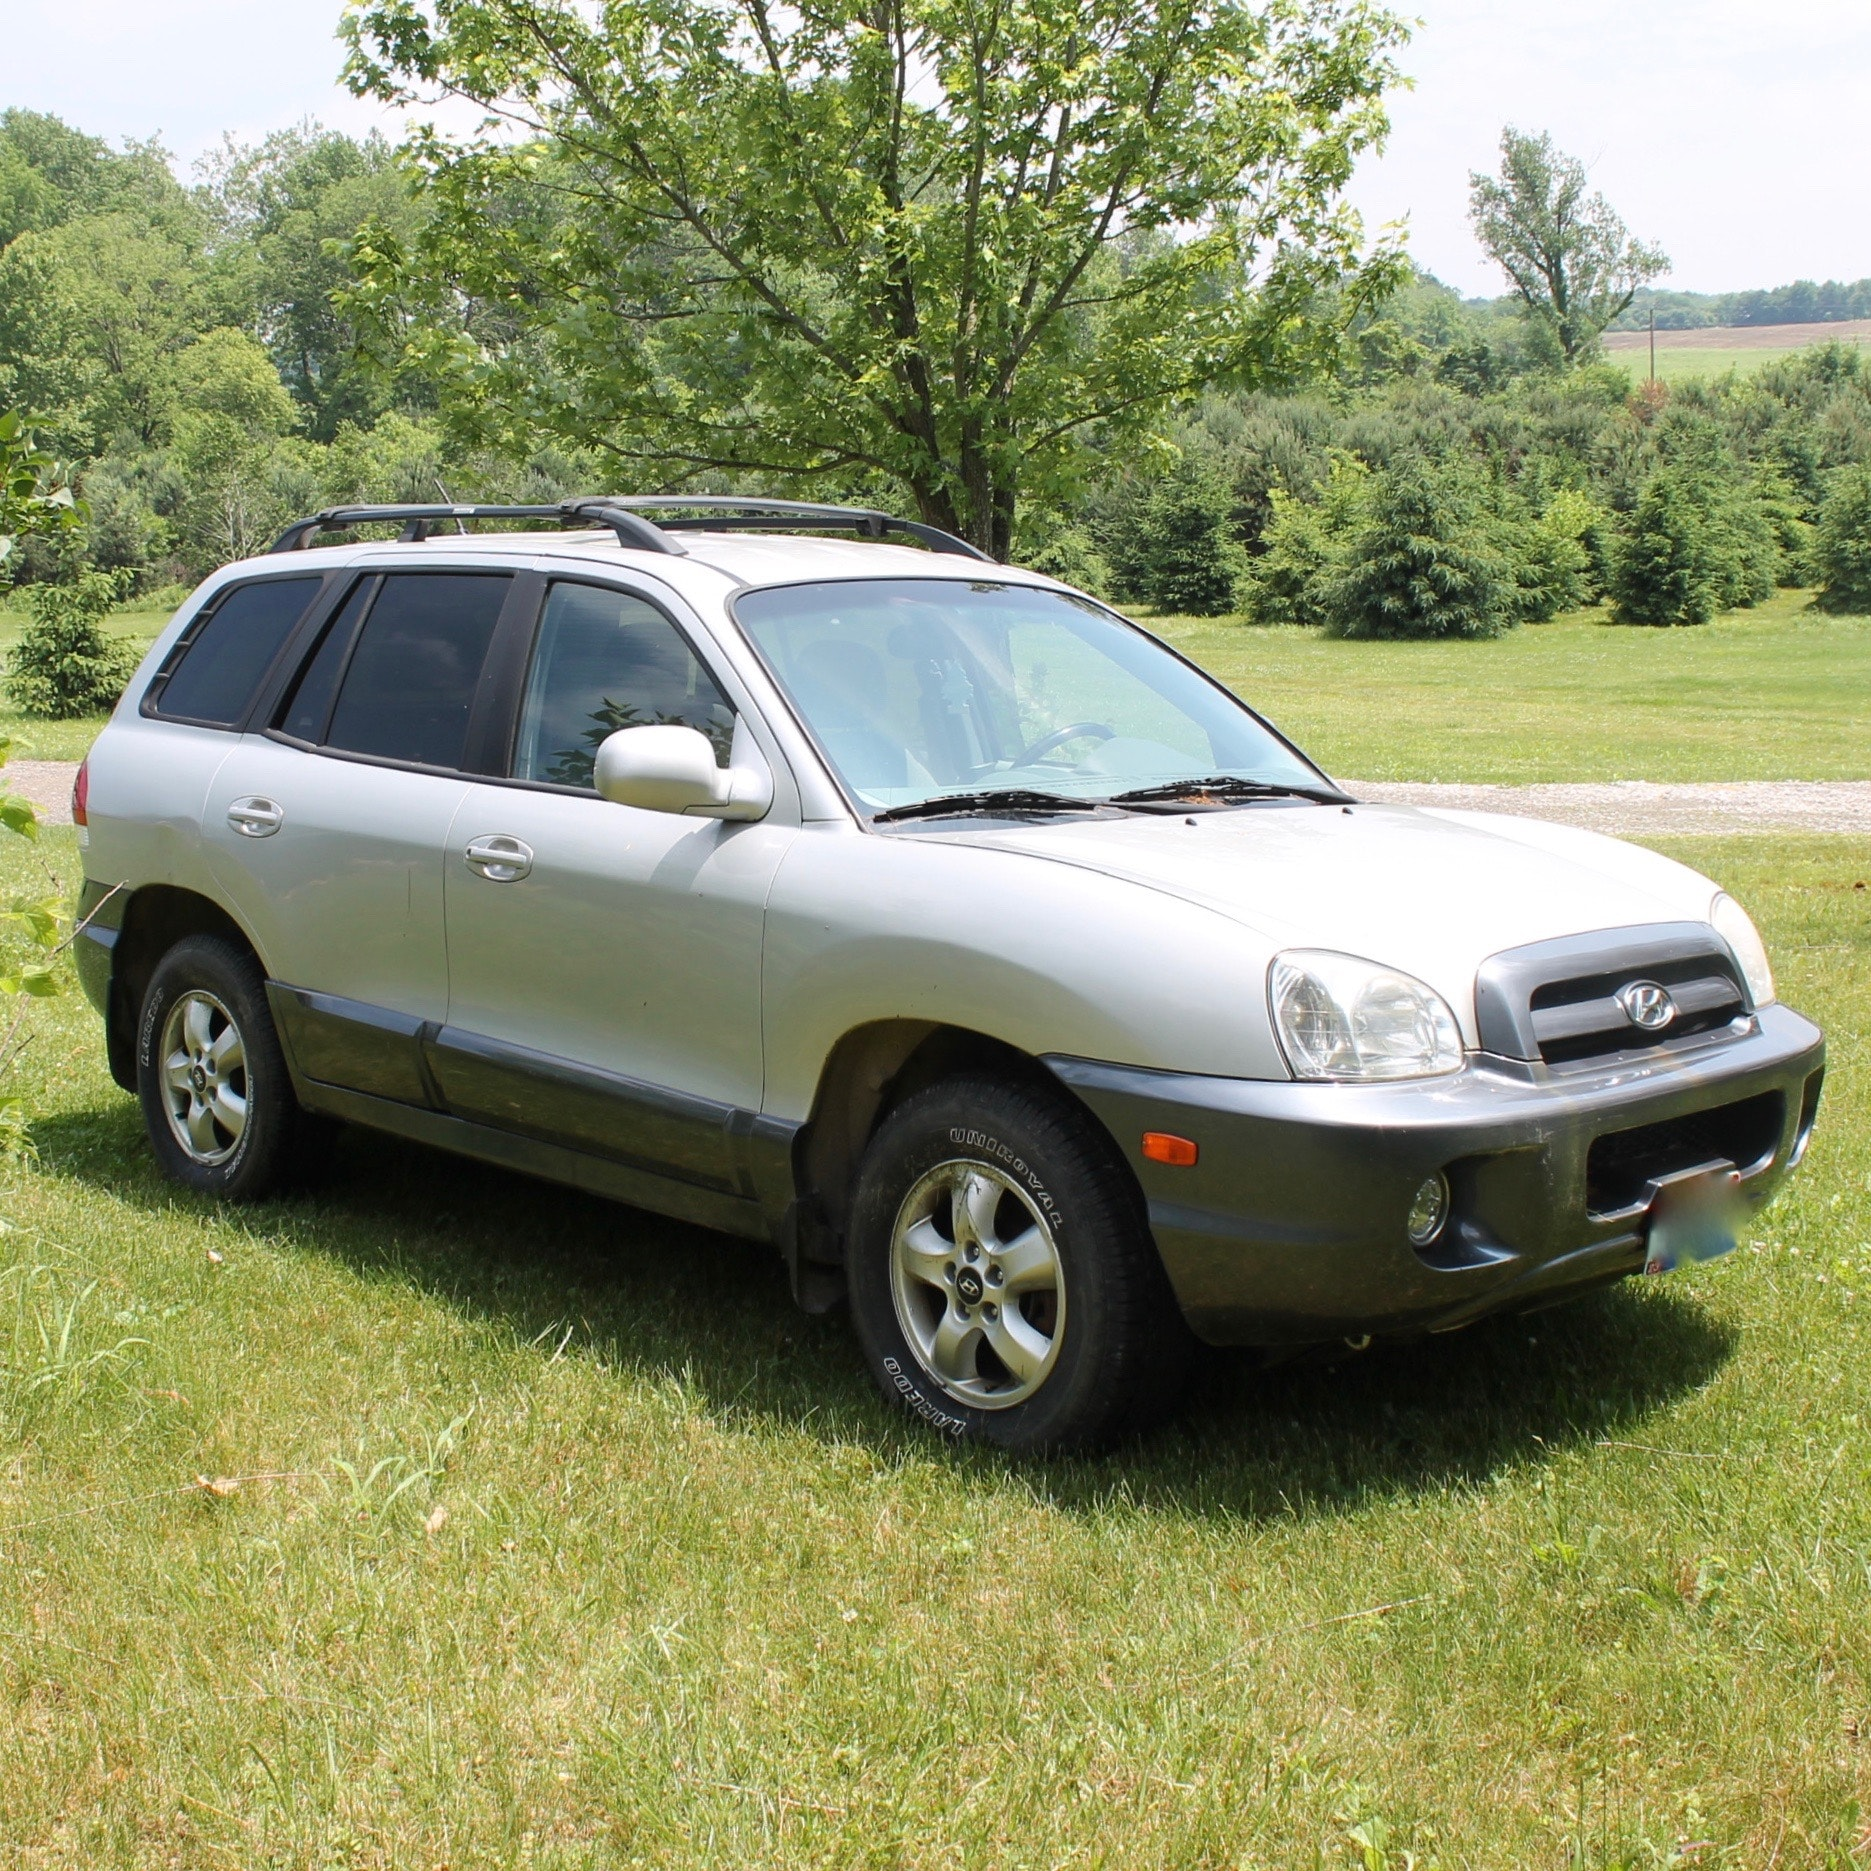 2006 Hyundai Santa Fe Compact Crossover SUV